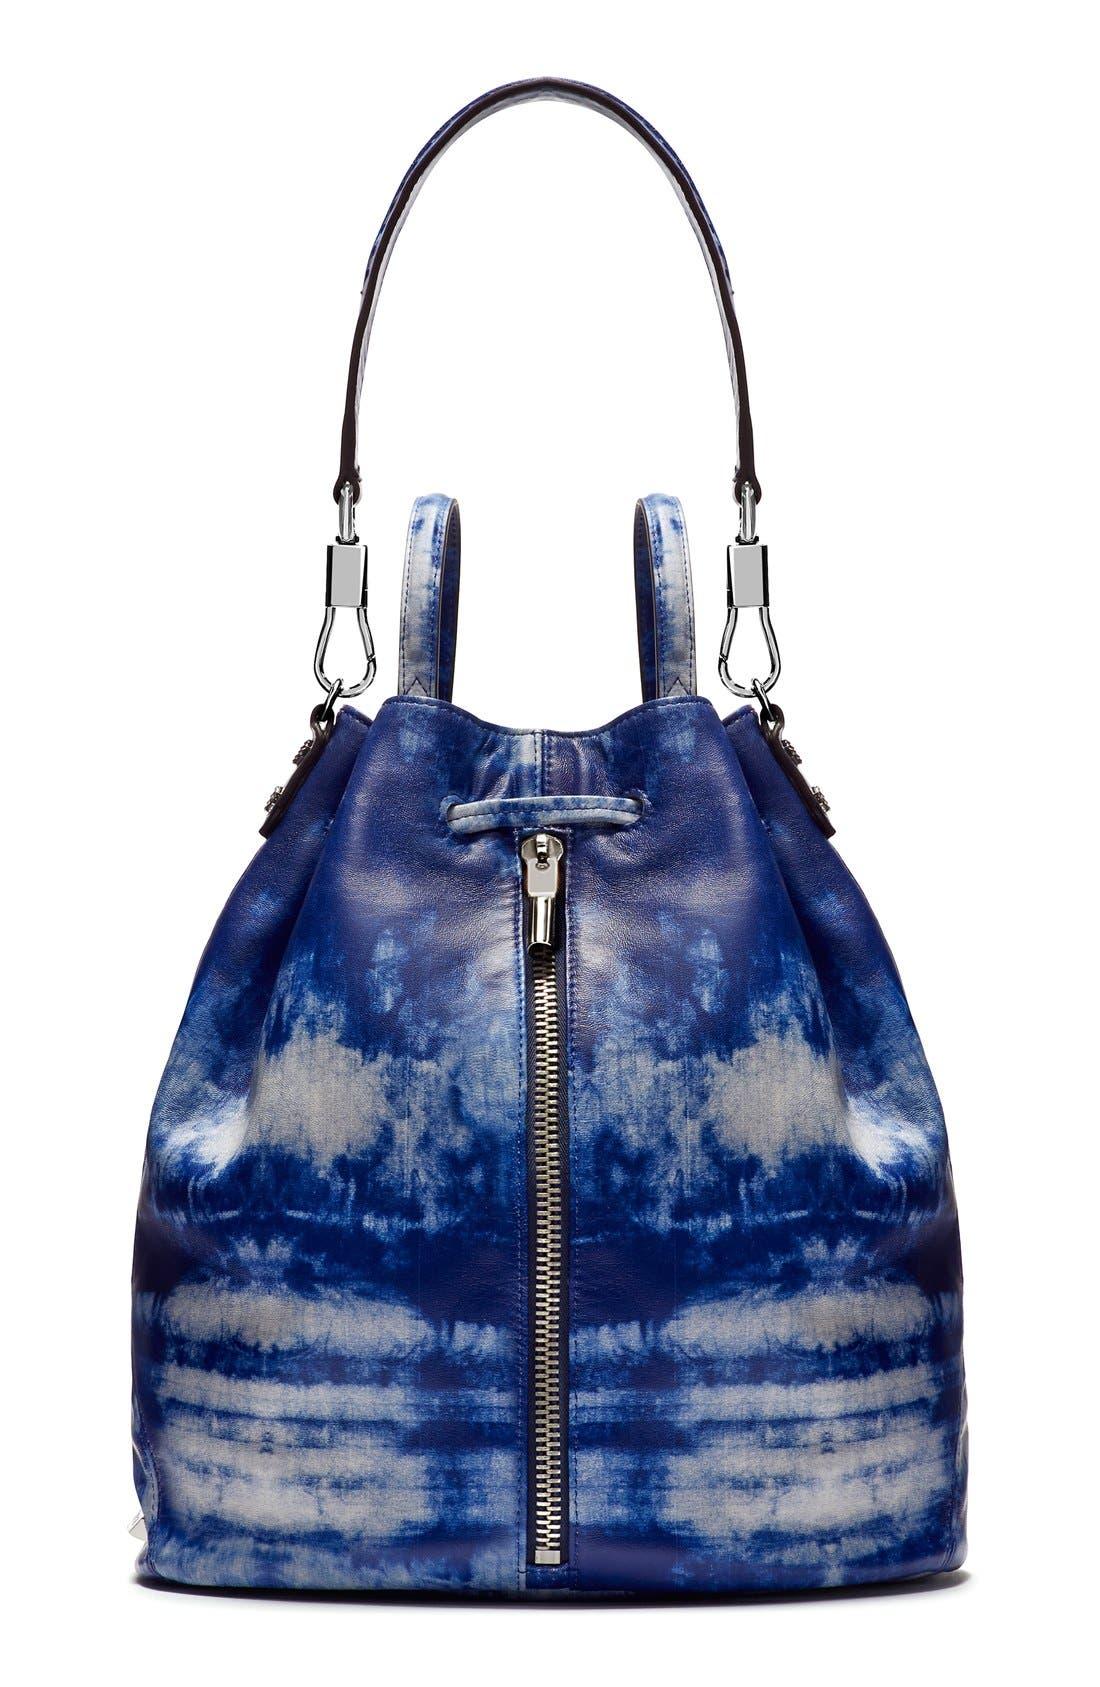 Alternate Image 1 Selected - Elizabeth and James 'Cynnie' Tie Dye Sling Backpack